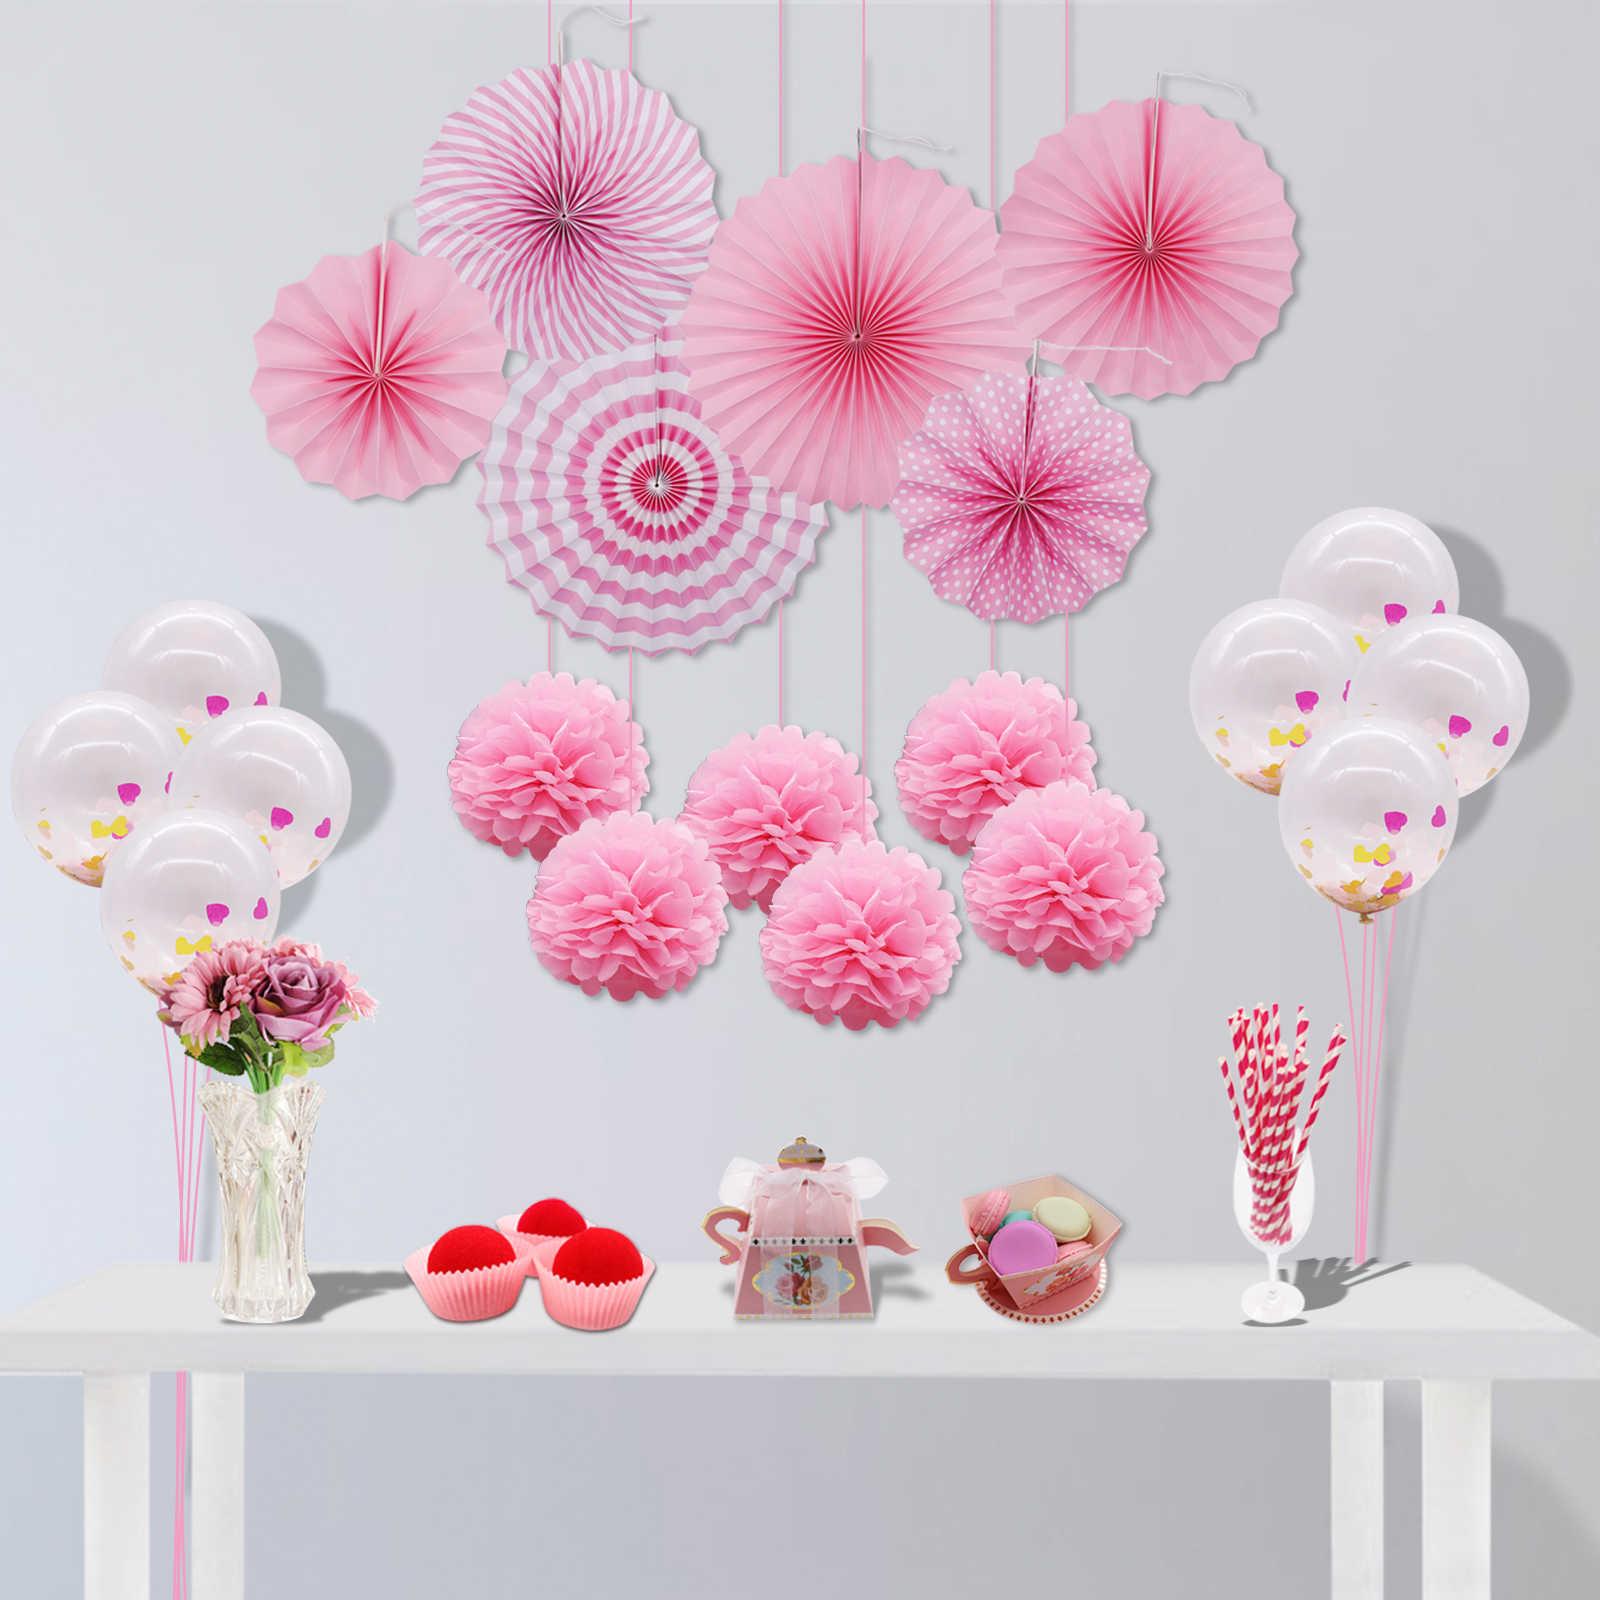 77dc64c48582 DIY Wedding Decoration Flower Paper Fan Rose Gold Birthday Party Balloons  Lantern Honeycomb Ball Baby Shower